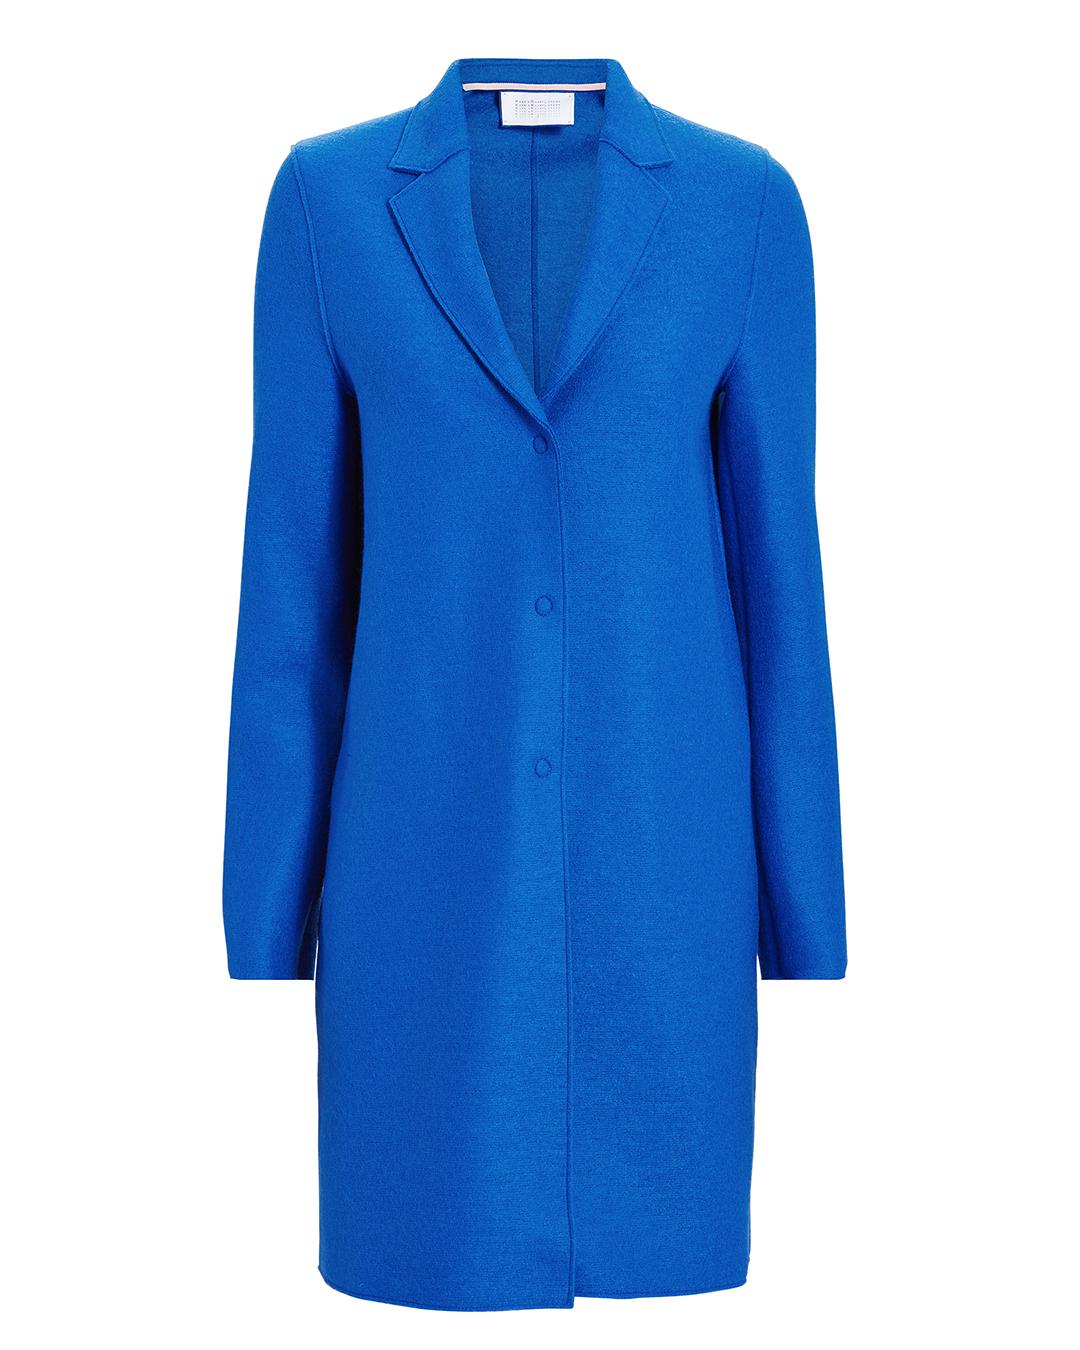 HARRIS WHARF LONDON ELECTRIC BLUE COCOON COAT BLUE-MED